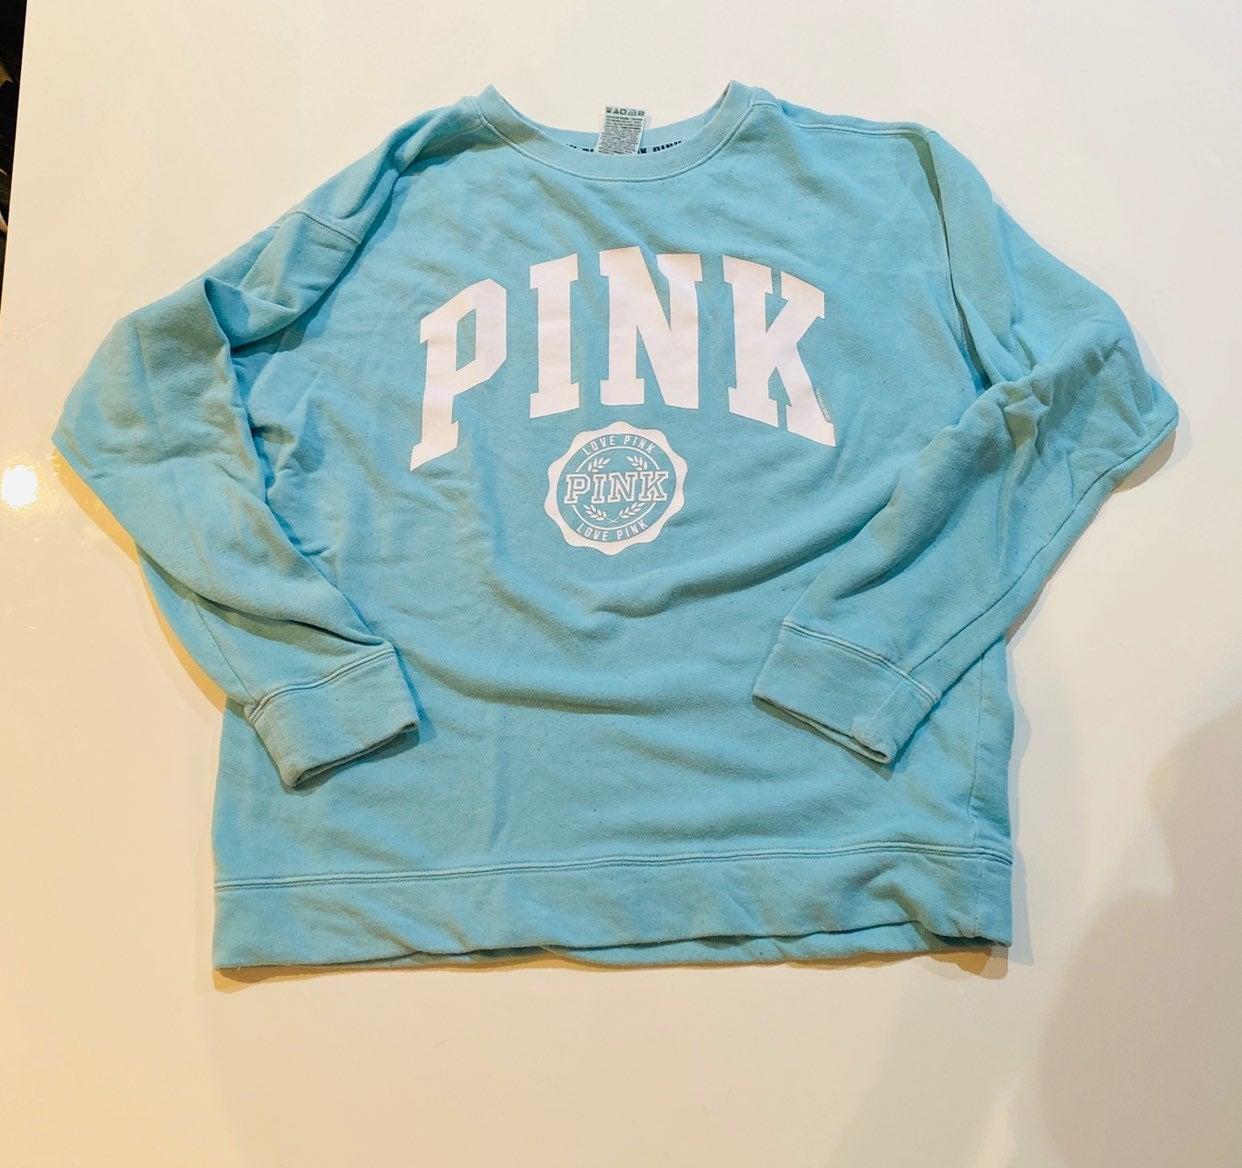 PINK Crewneck Sweatshirt Light Weight